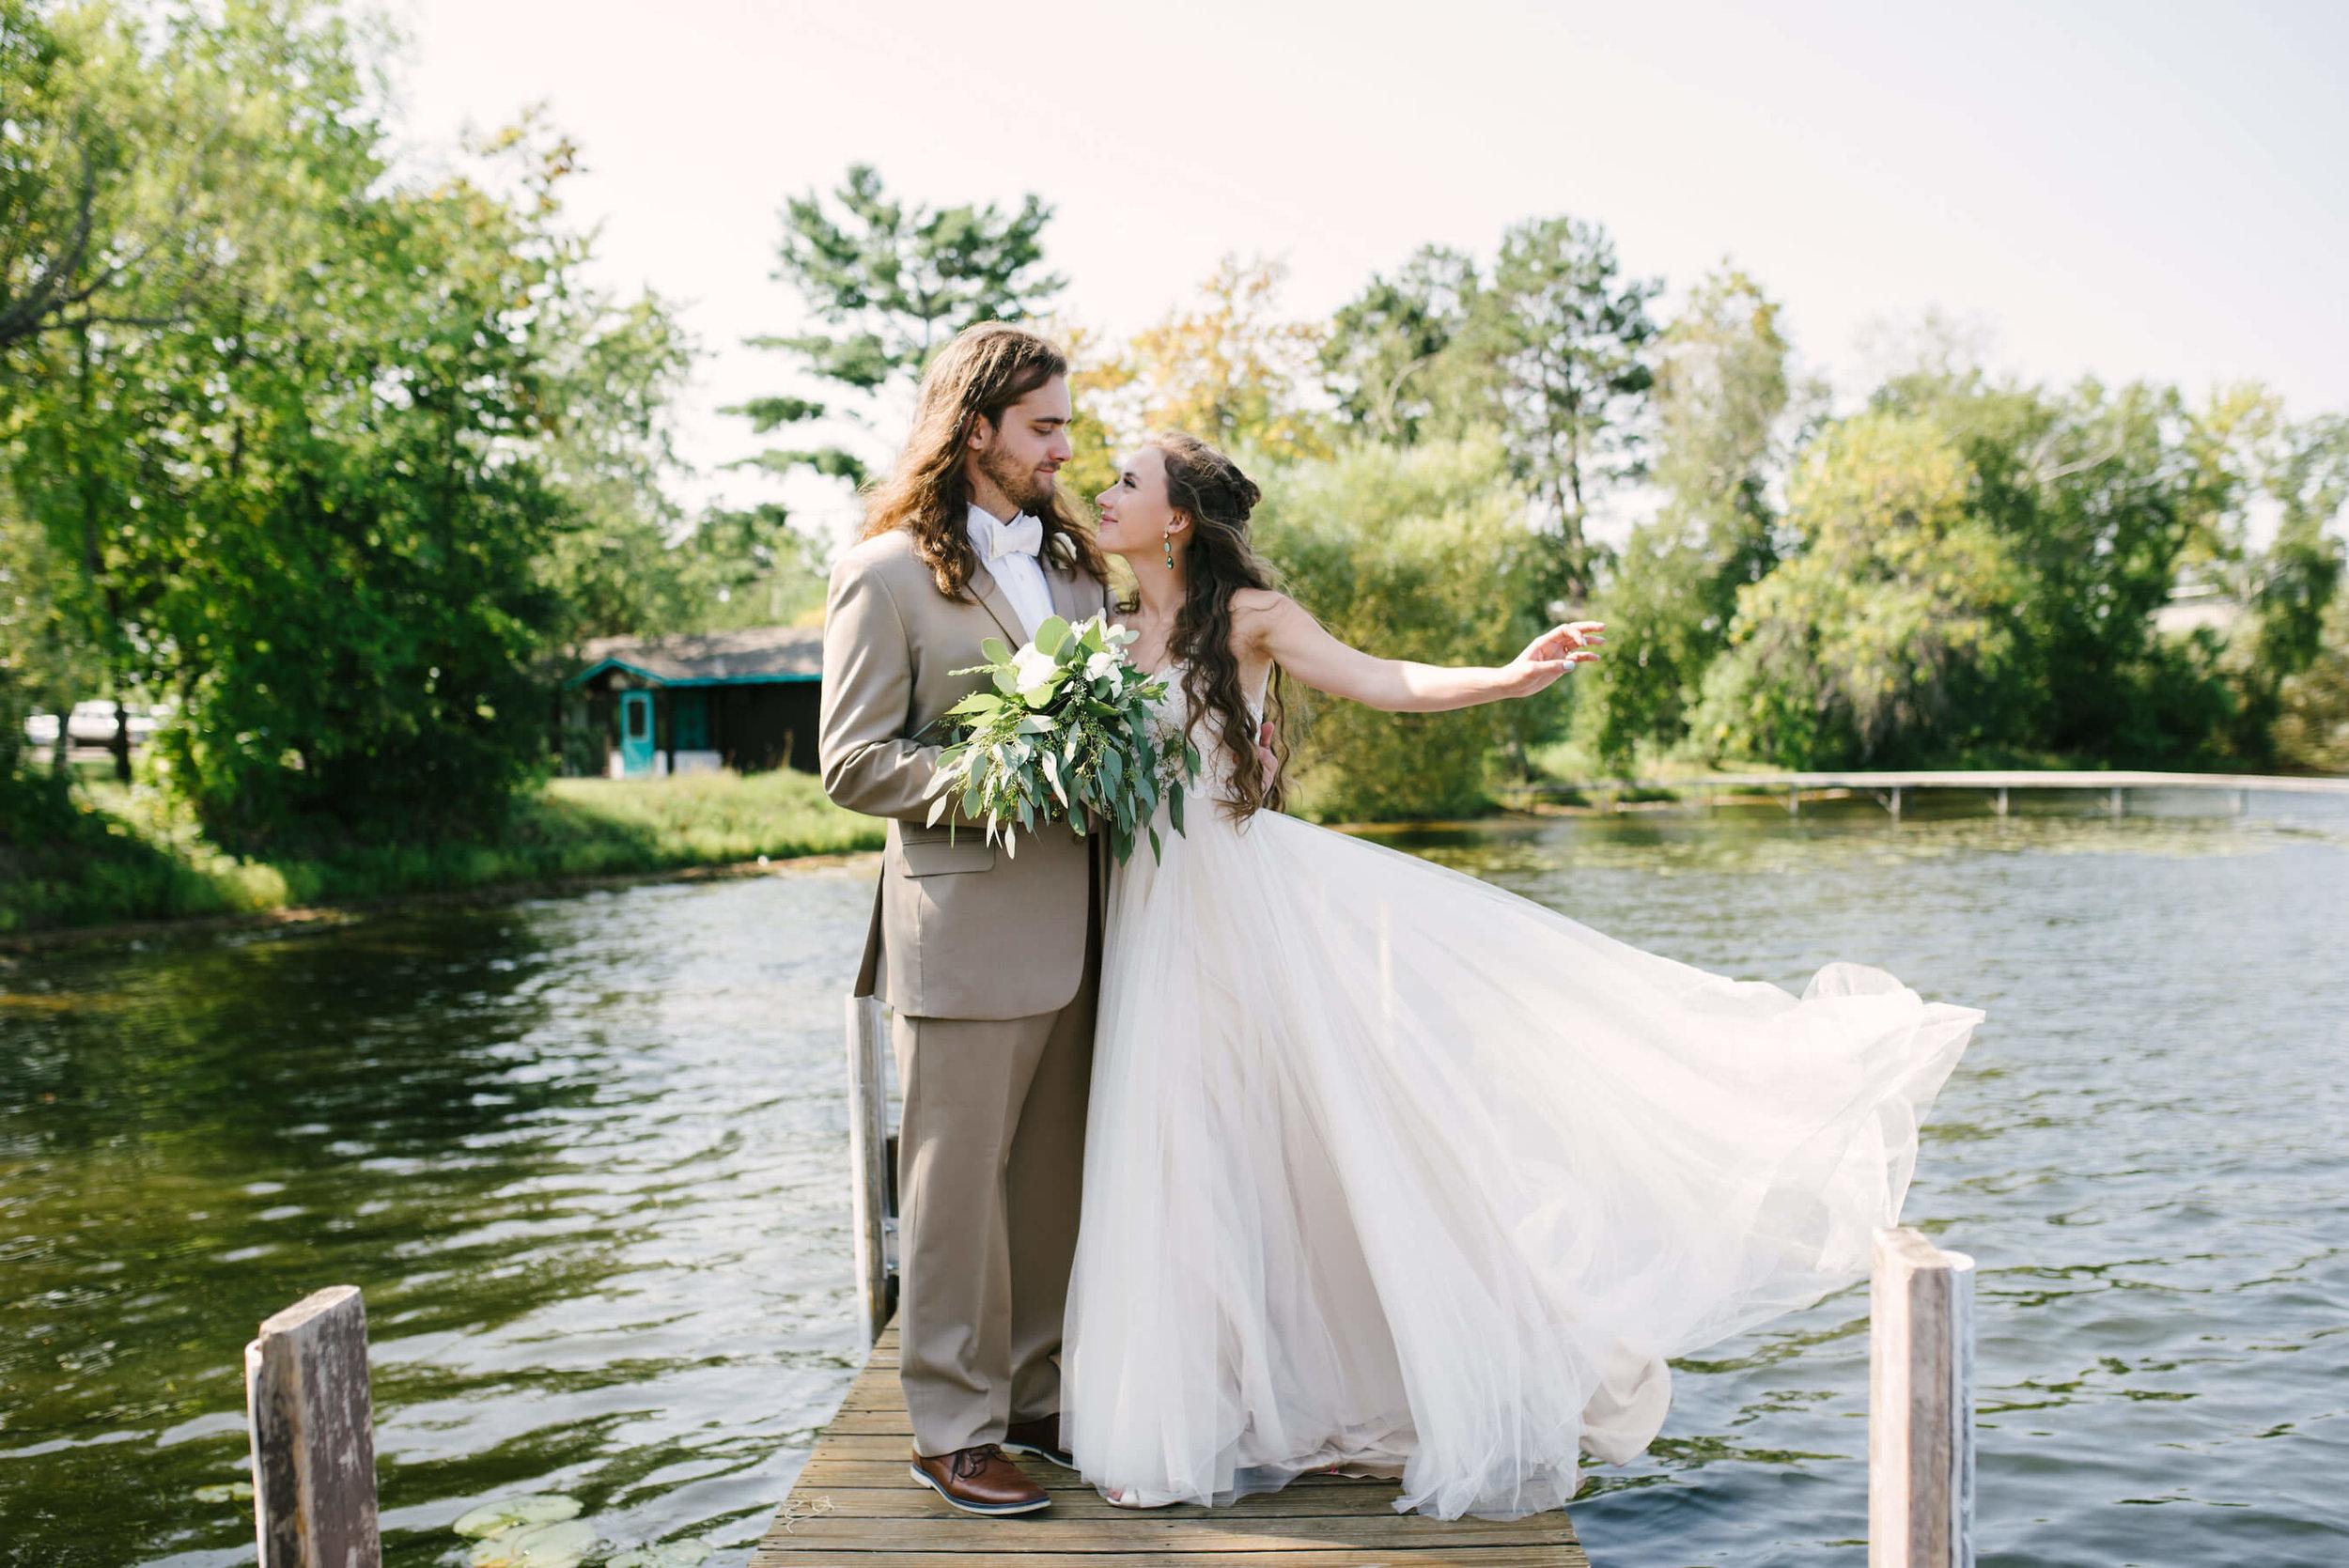 engle-olson-wedding-blair-taylor-23.jpg